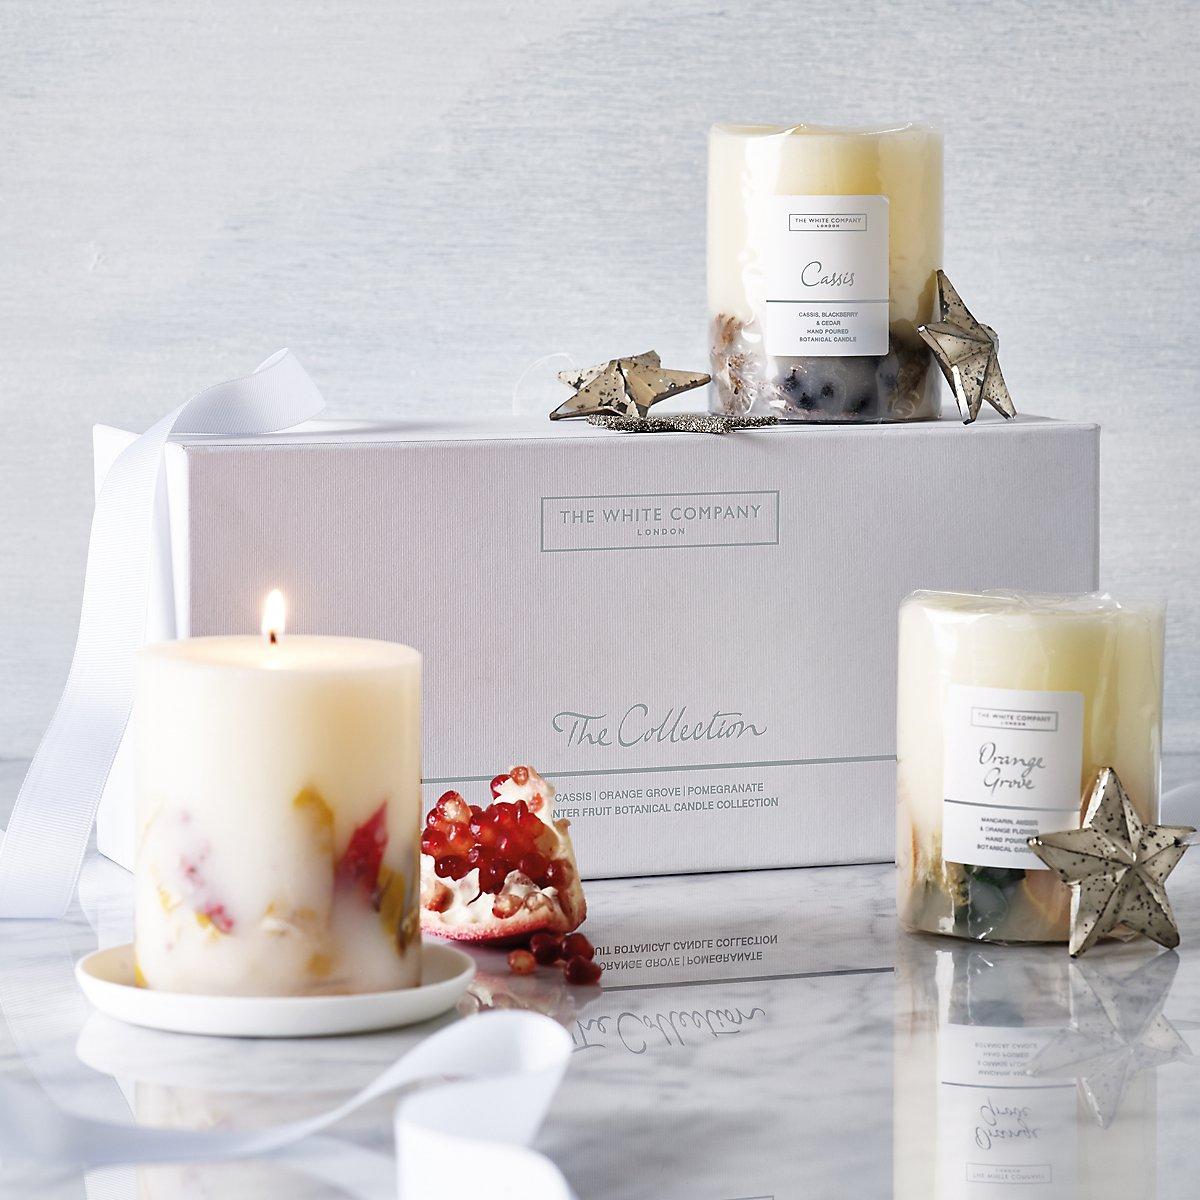 Interior design home fragrance gift set - Winter Fruits Collection